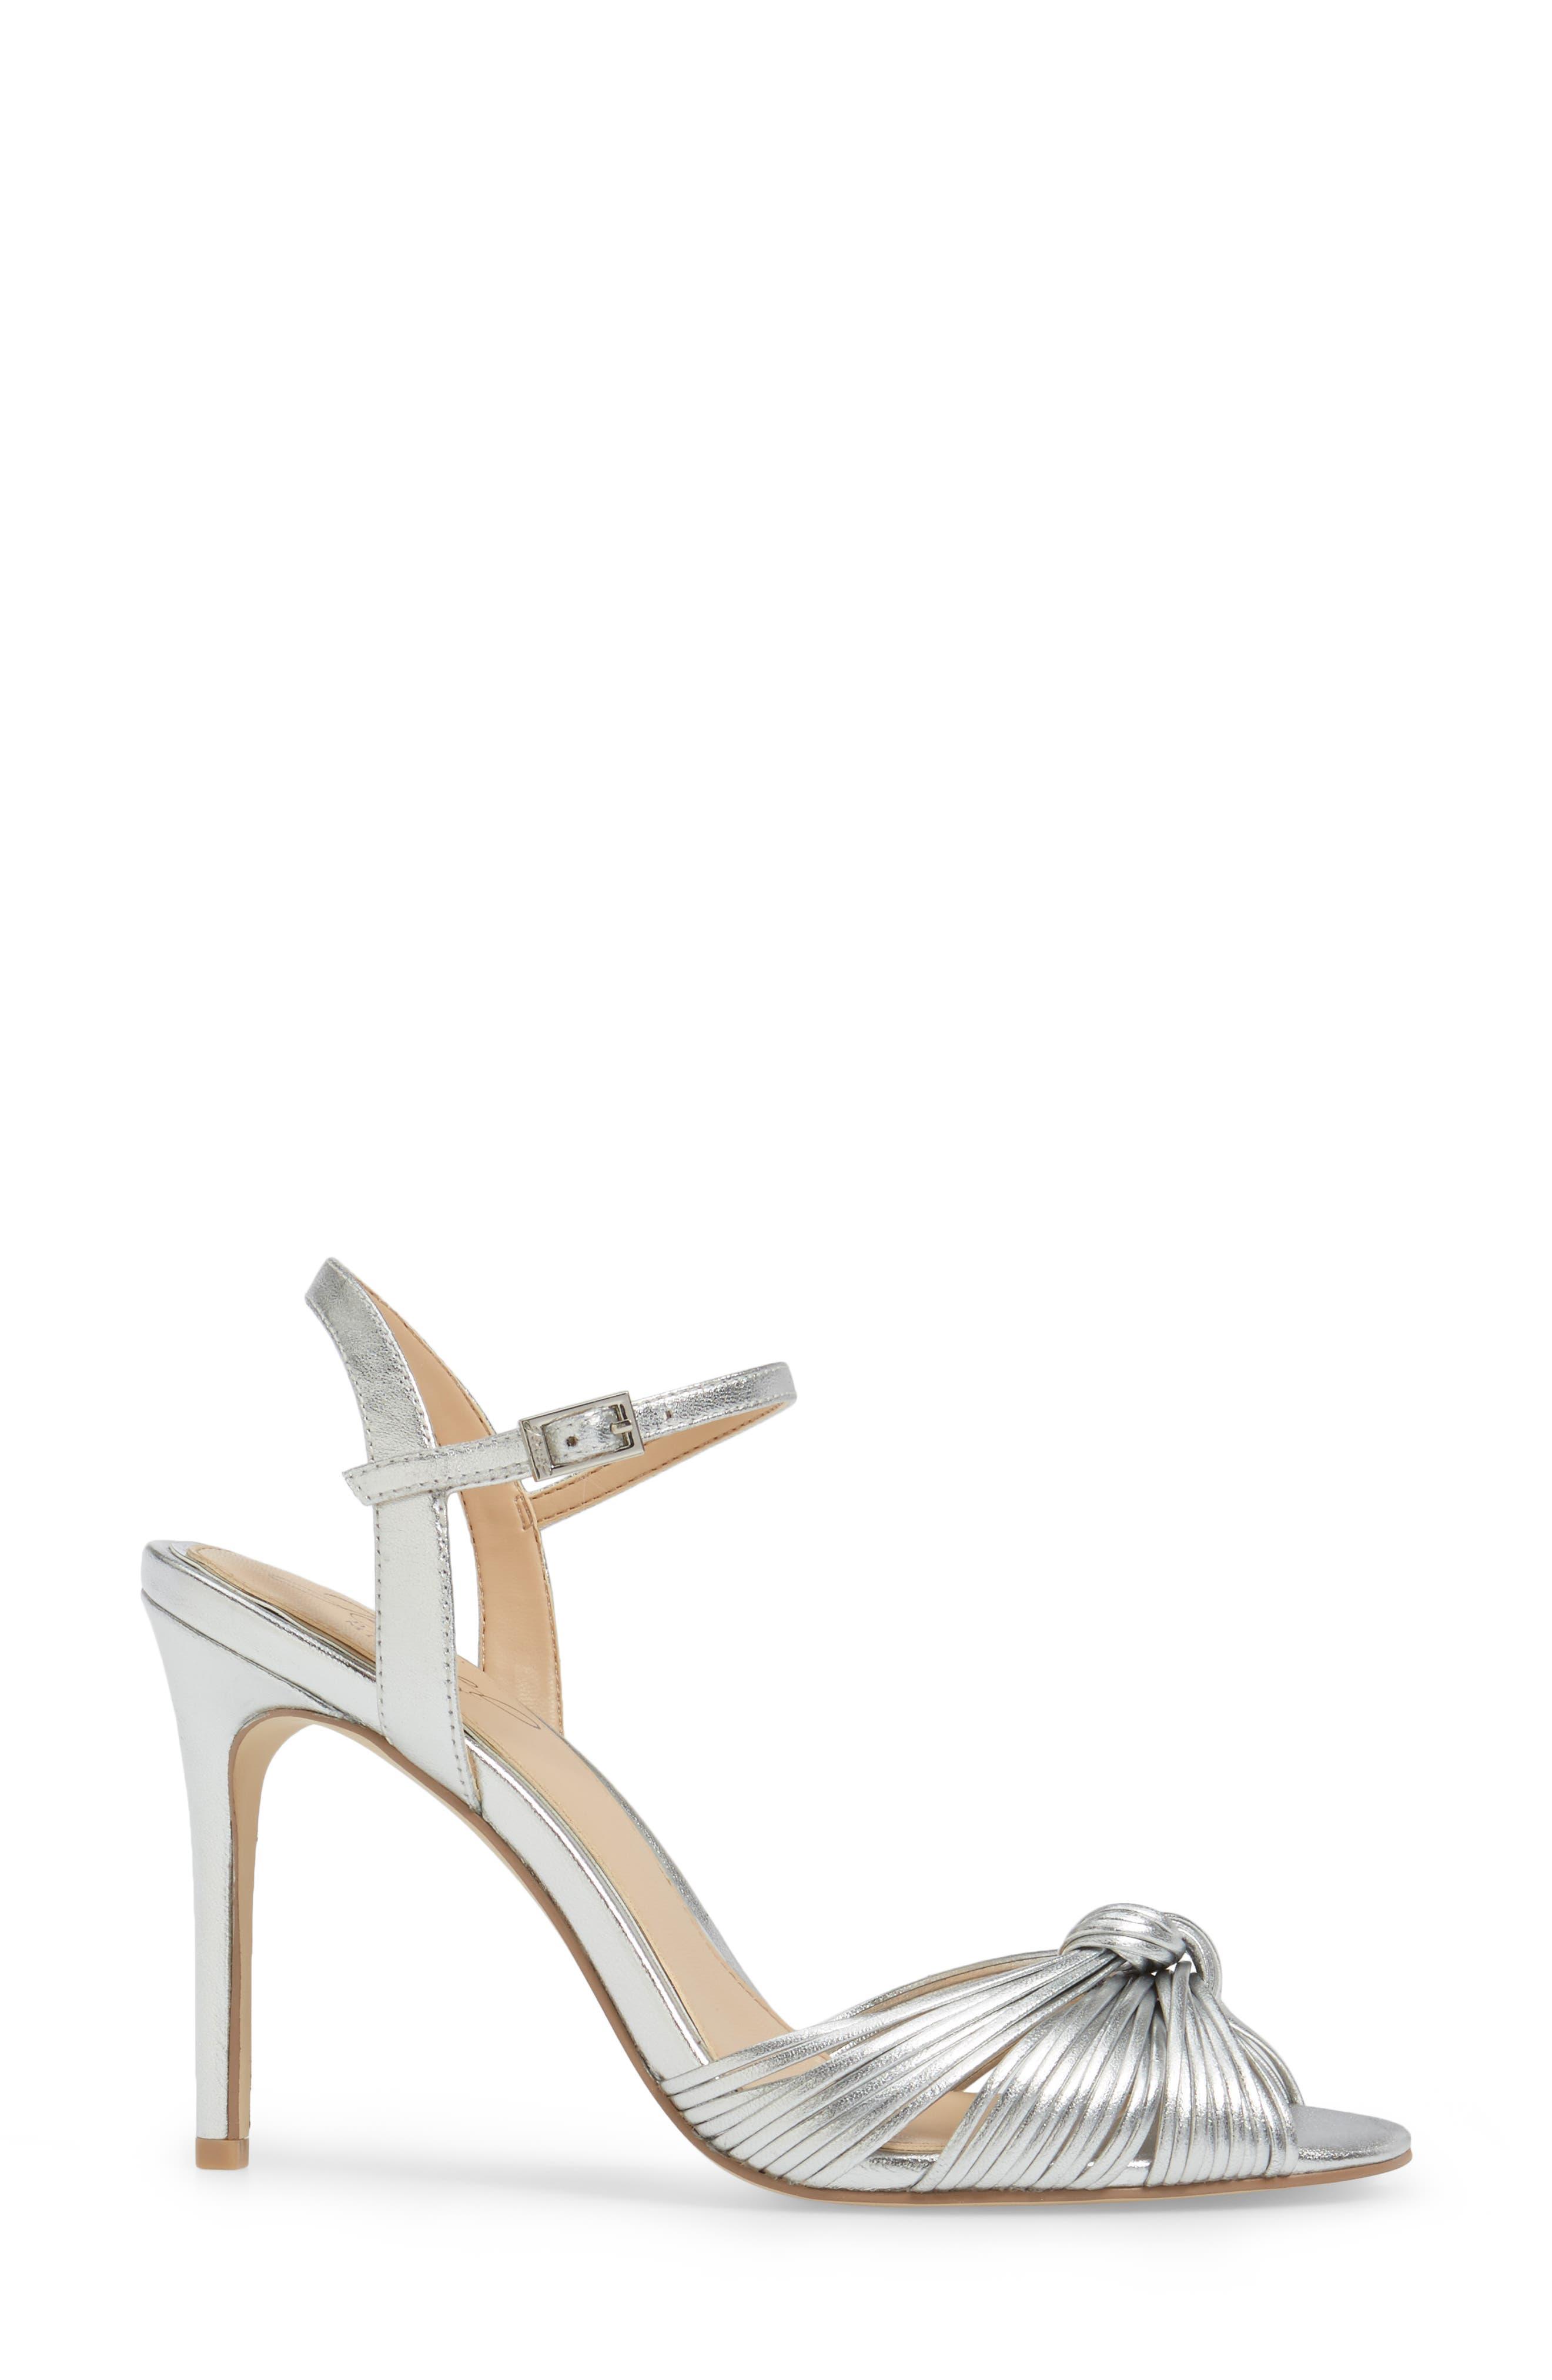 Lady Ankle Strap Sandal,                             Alternate thumbnail 3, color,                             046